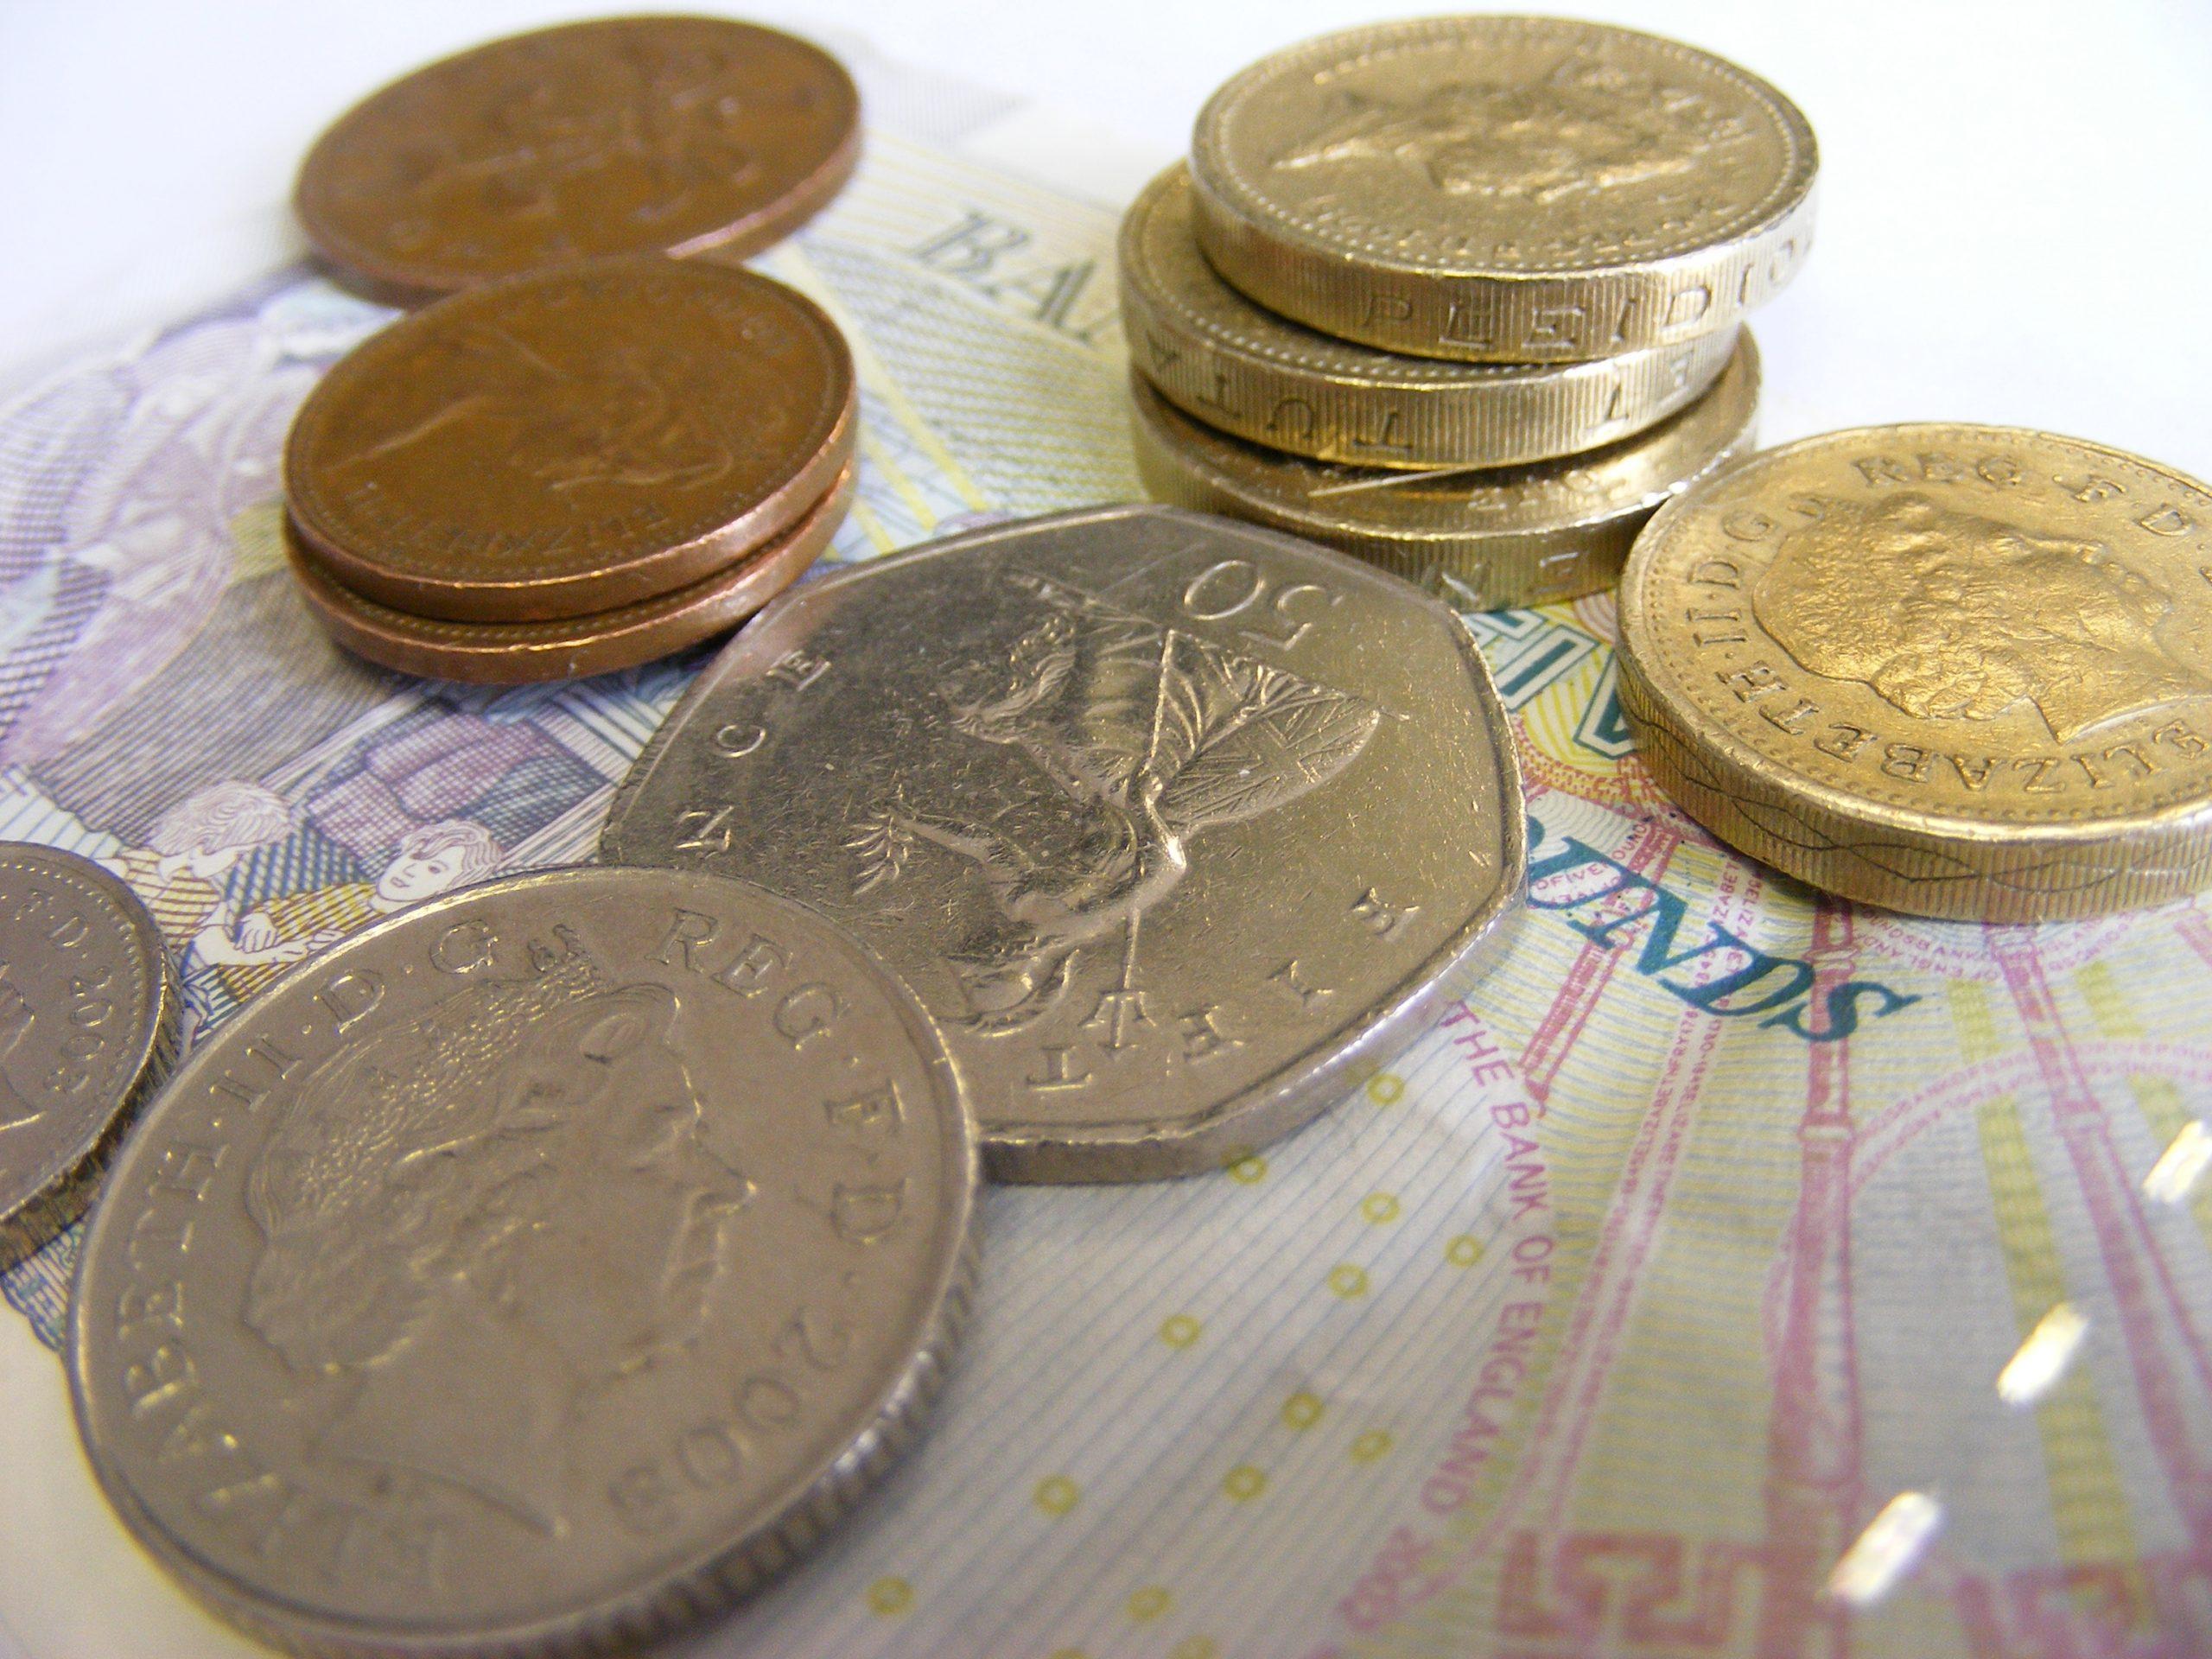 Council defend school lunch cash offer